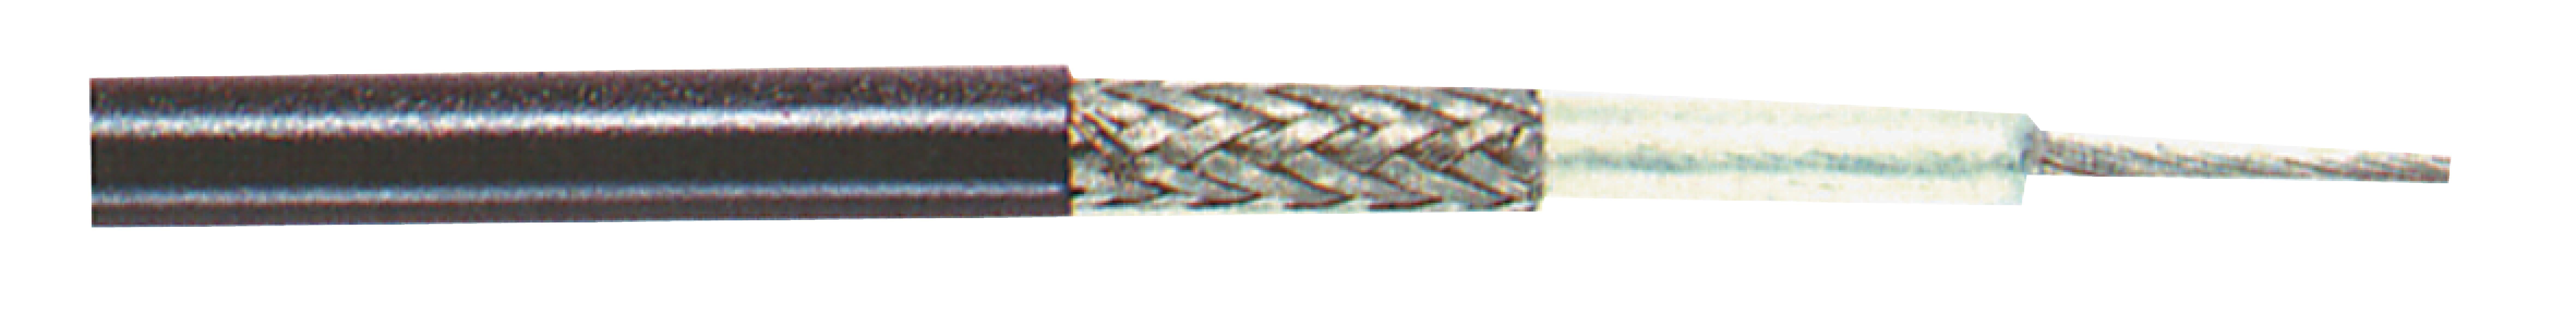 TASKER Kabel koaxiální rg58 profi, 100m - tasker